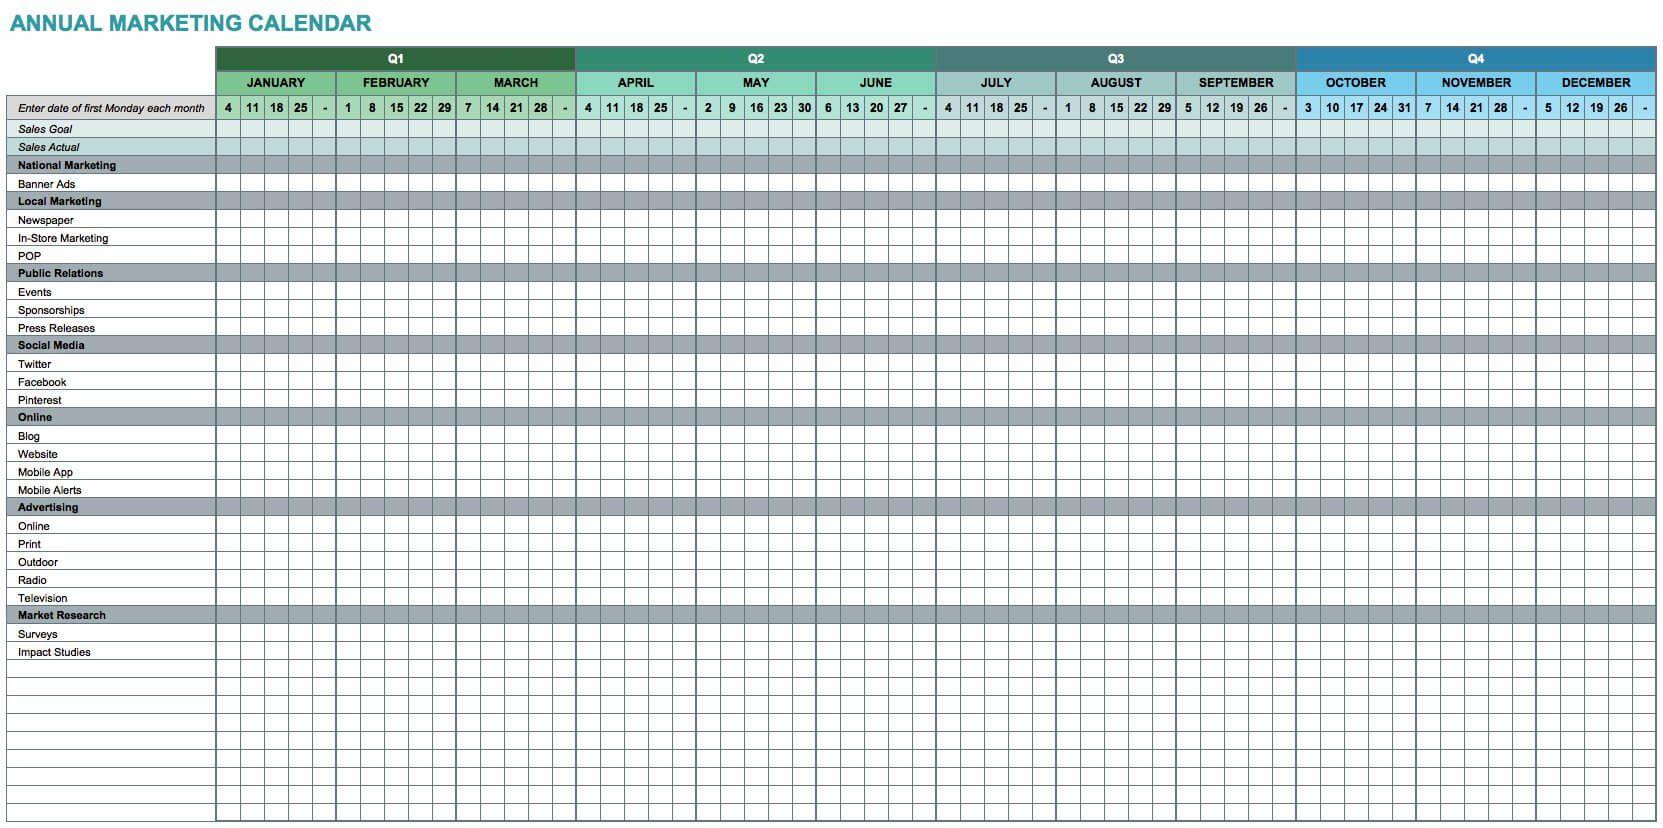 002 Wonderful Free Excel Calendar Template Photo  2020 Monthly Download Biweekly Payroll 2018Full